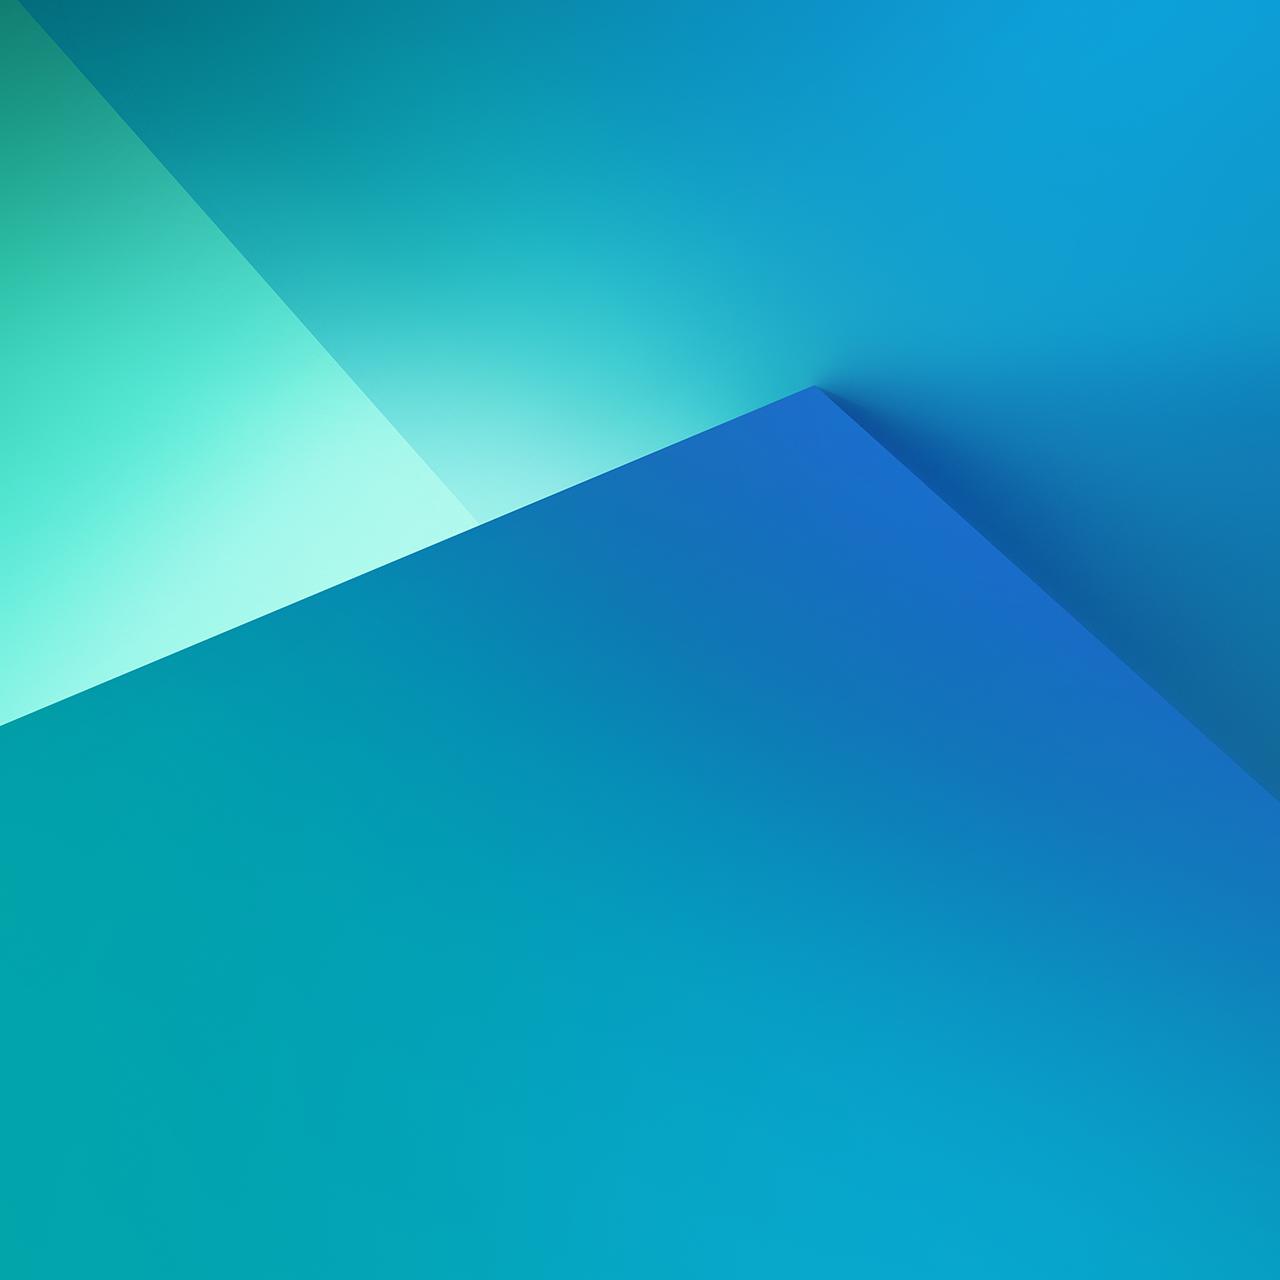 Download Samsung Galaxy Xcover 4 Wallpaper Sammobile